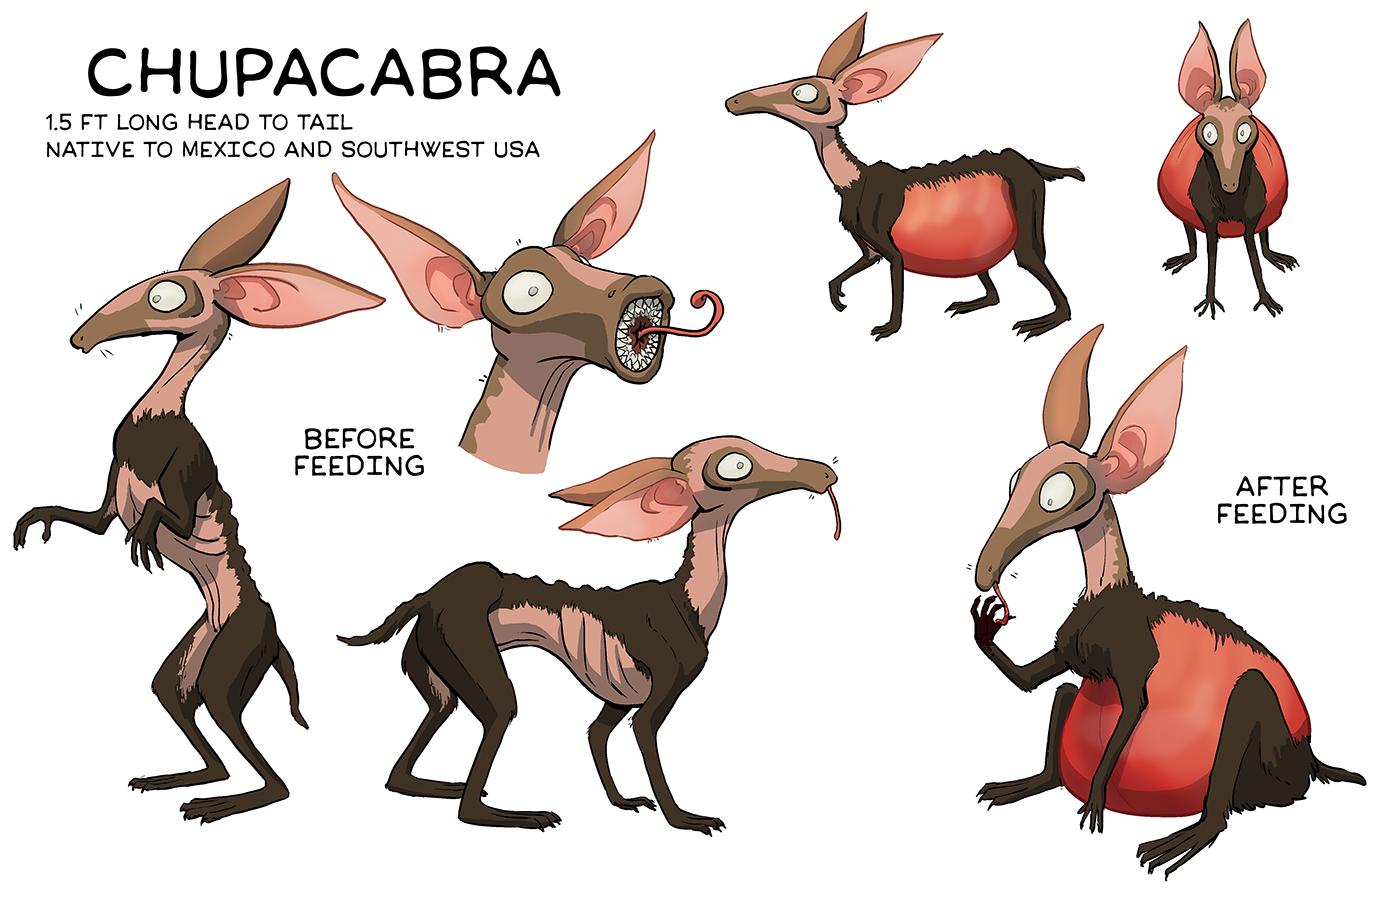 Creature design of a chupacabra as a harmless, mosquito-like pest